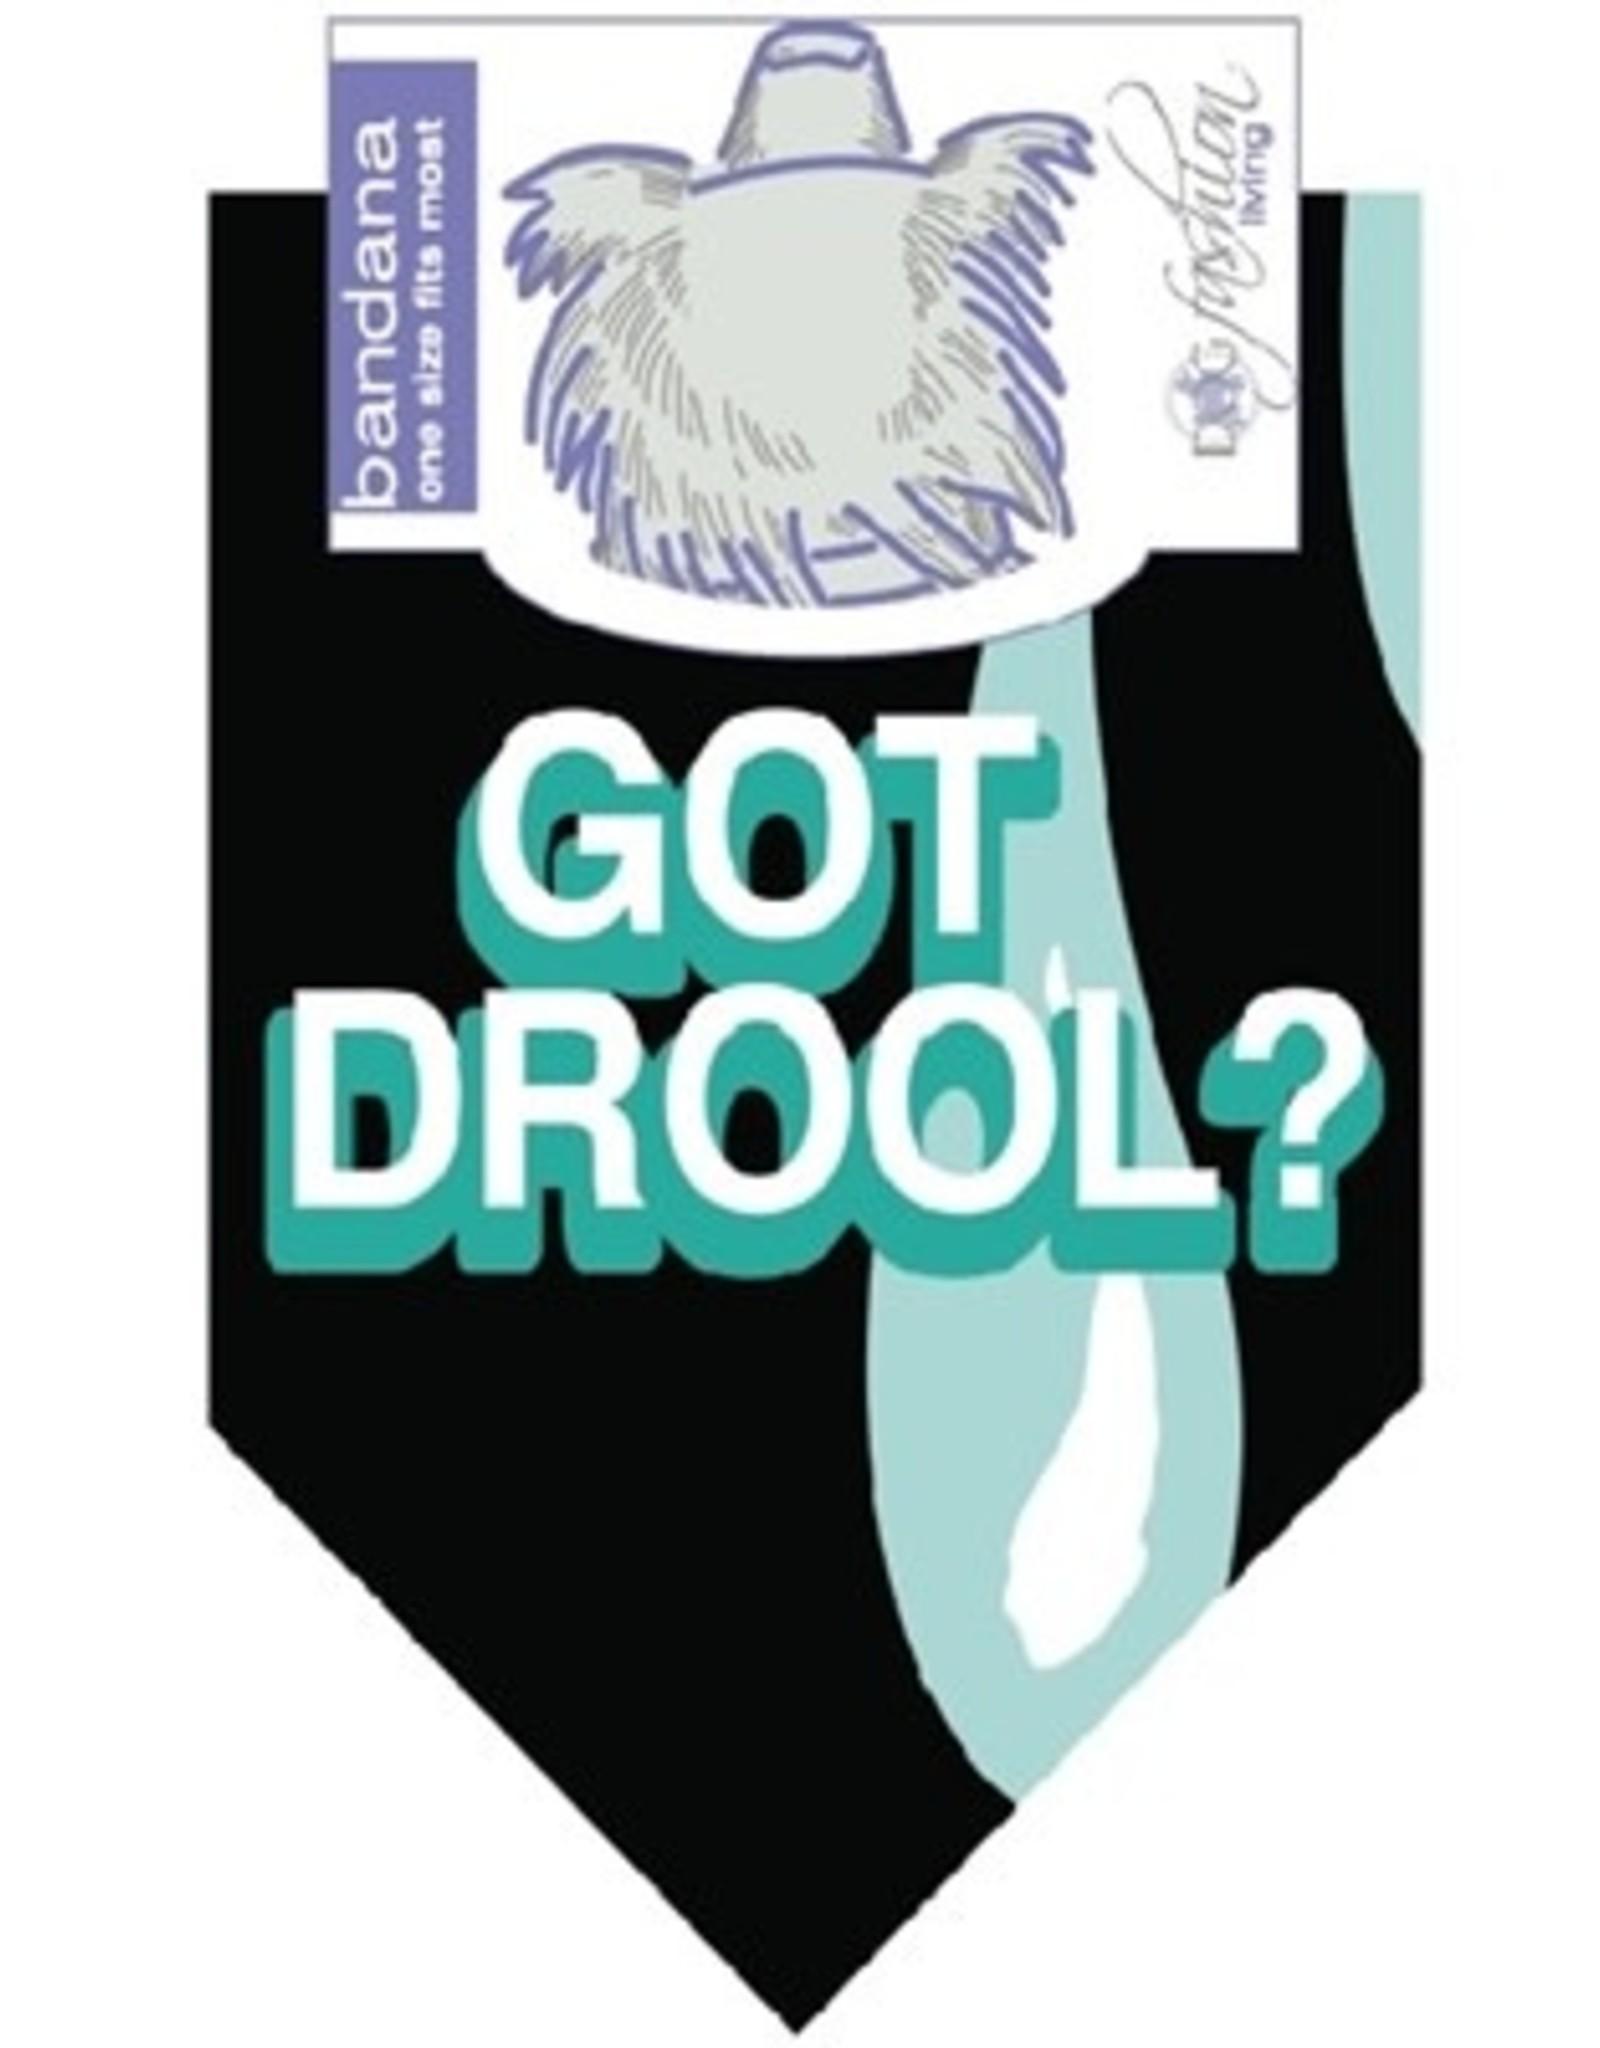 Dog Bandana - Got Drool?